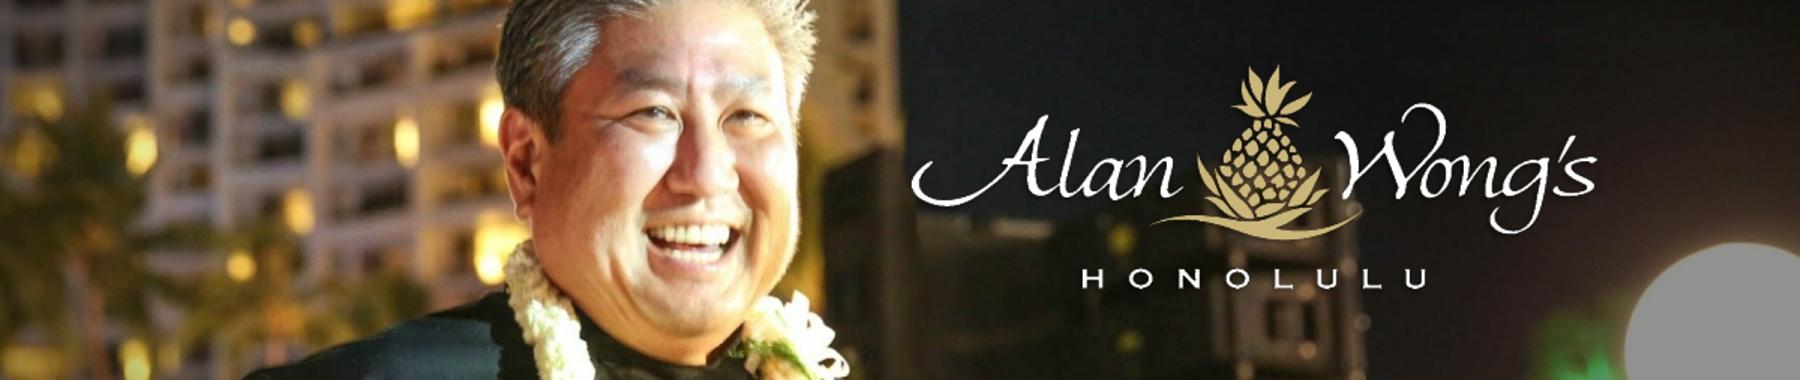 hdr-chef-alan-wong-1800.jpg